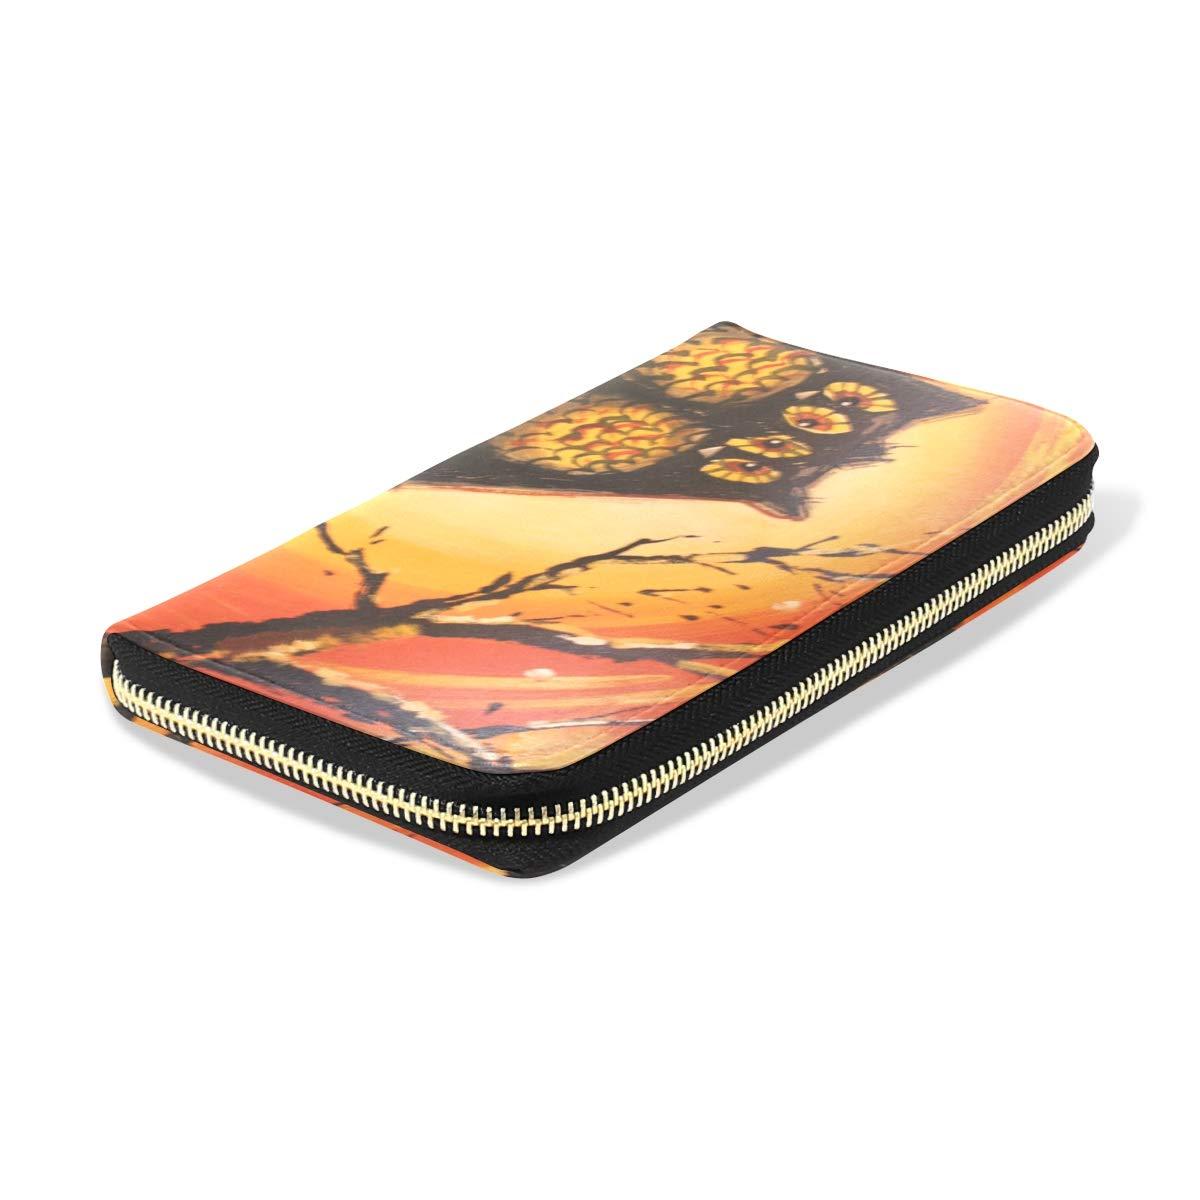 Womens Wallets Beautiful Cactus Custom Leather Passport Wallet Coin Purse Girls Handbags